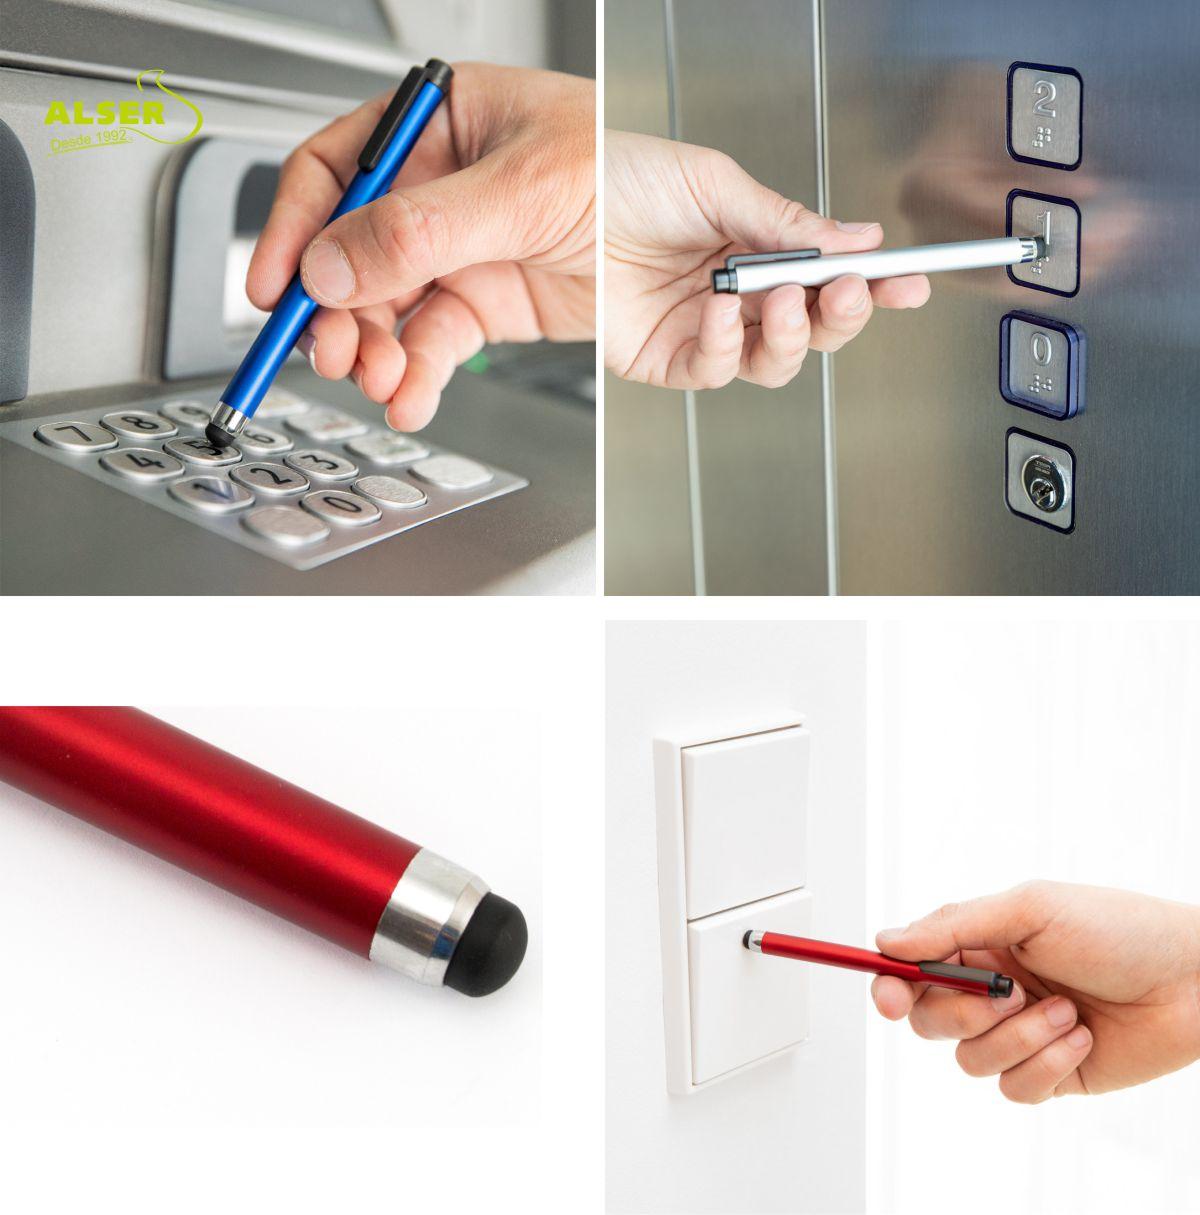 Lápiz táctil personalizado para negocios Detalles